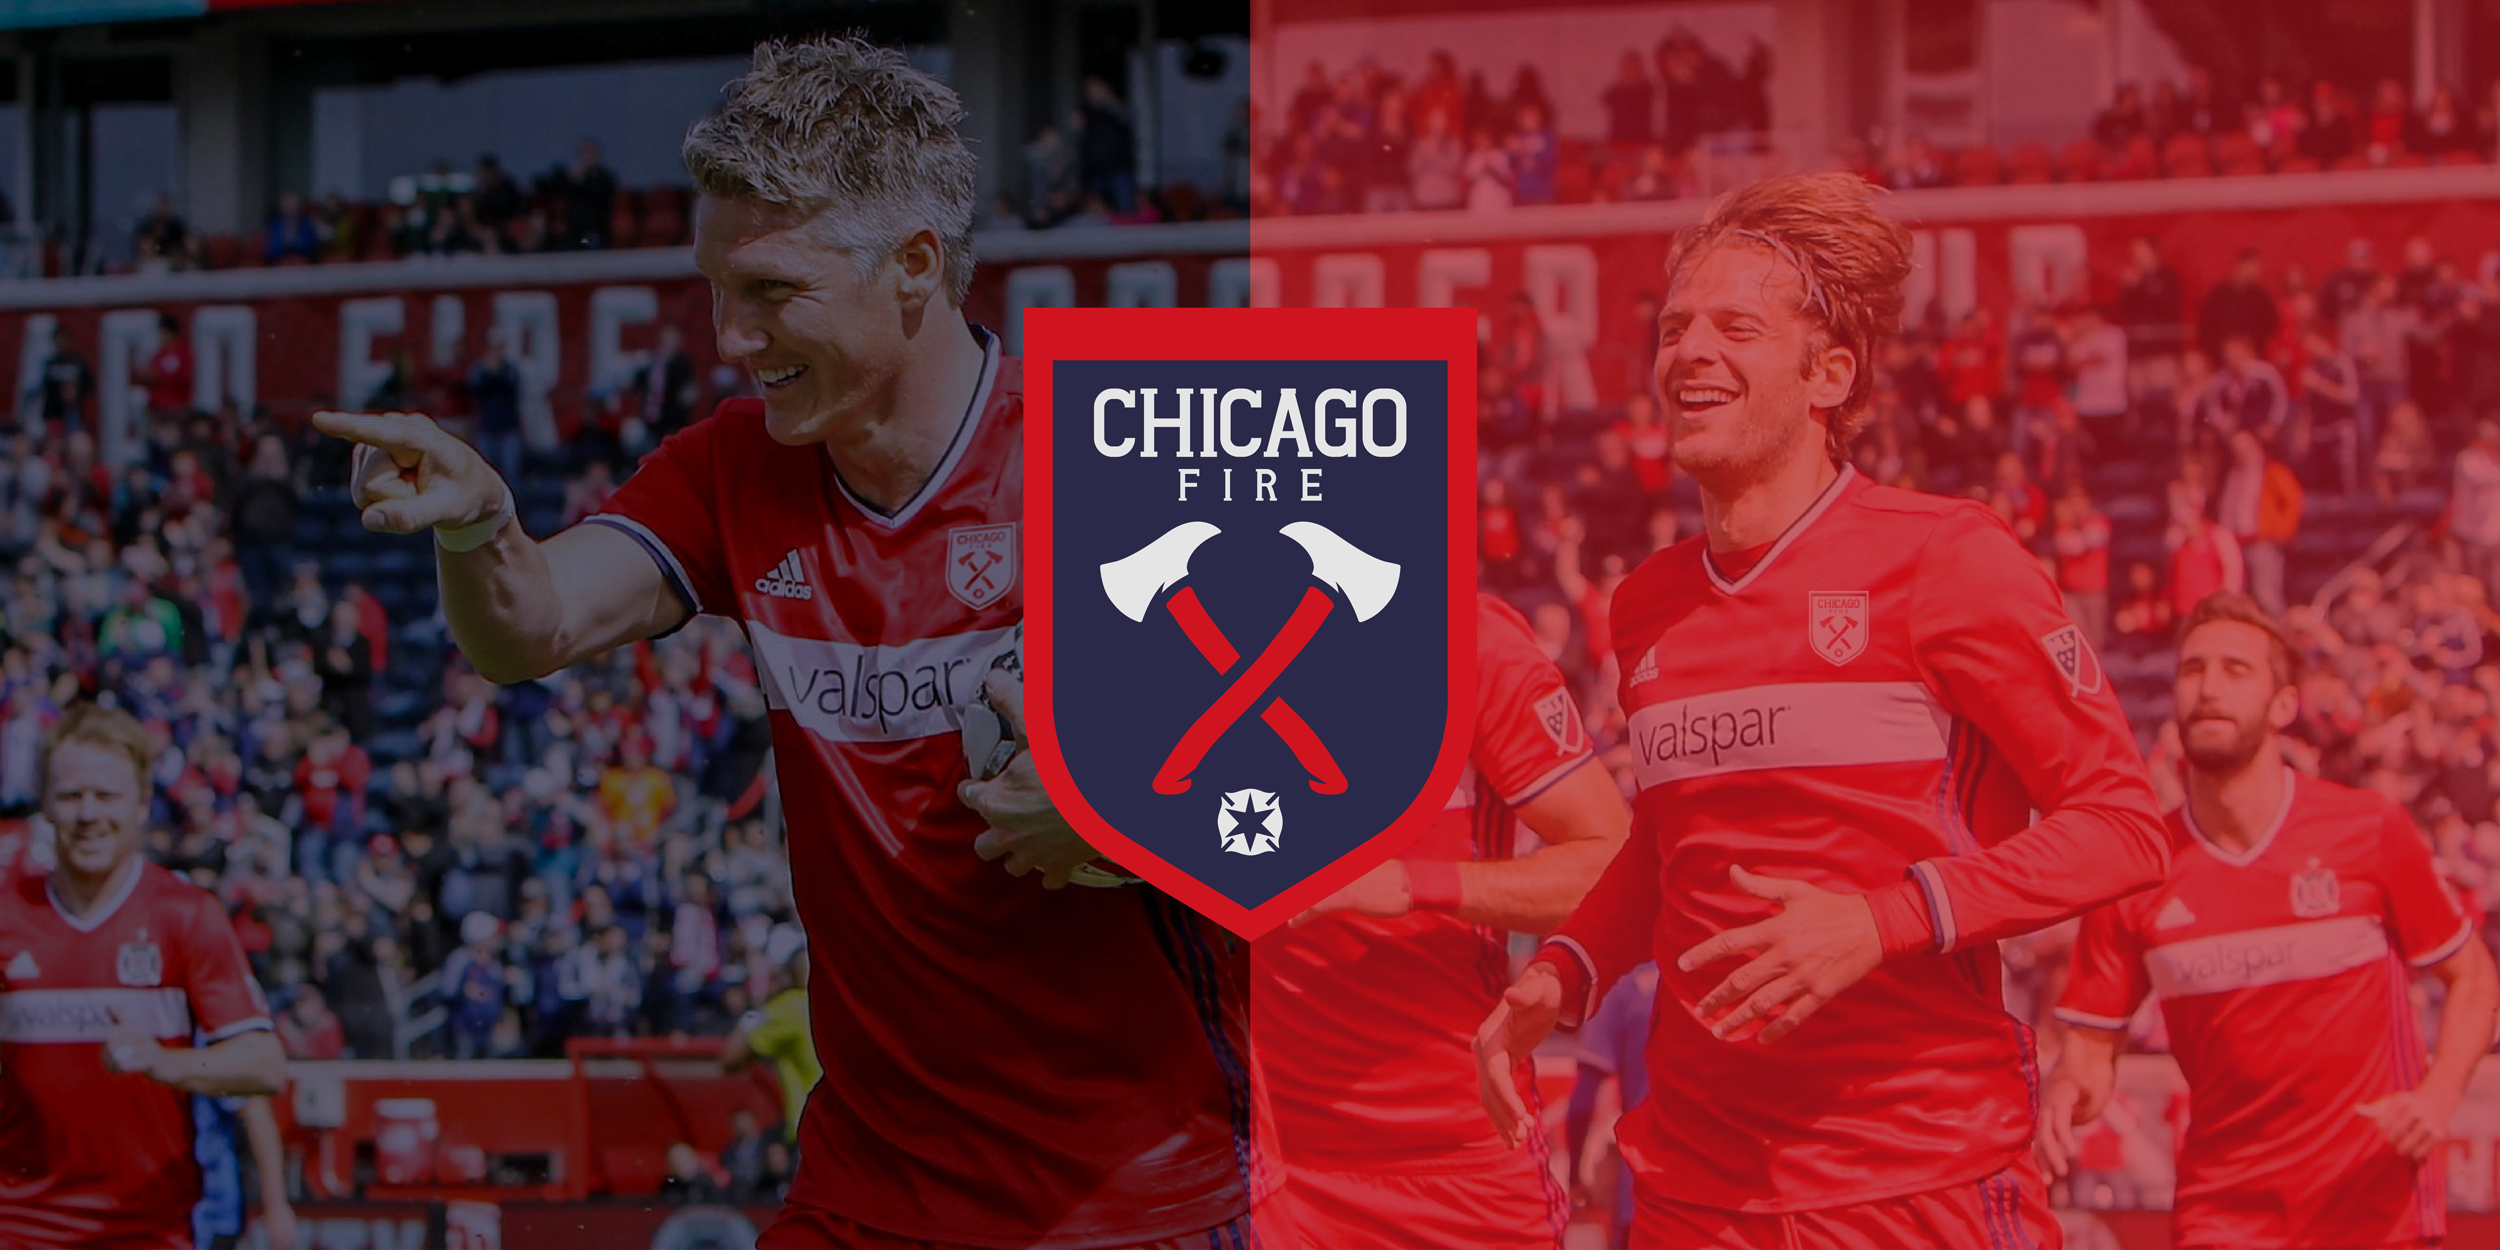 Chicago-Fire---Logo-Bastian-Shweinsteiger.jpg